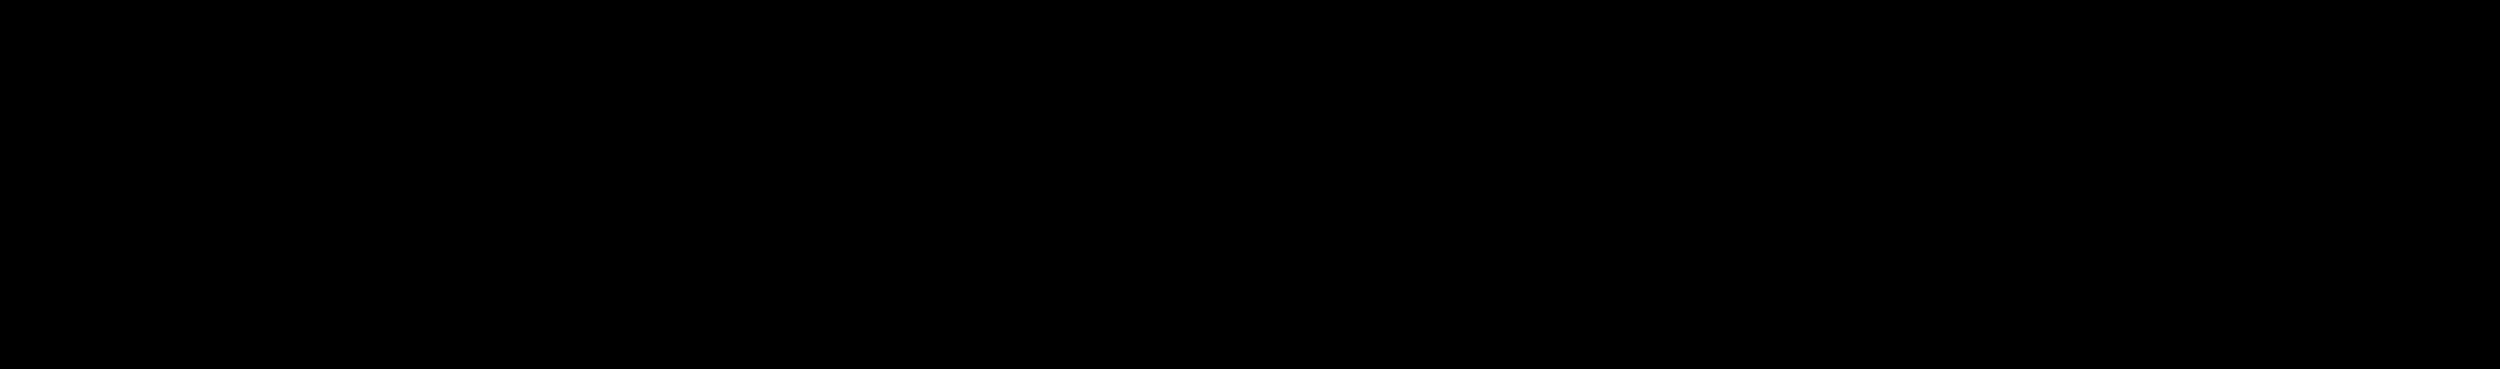 BDF_logo_1line.png